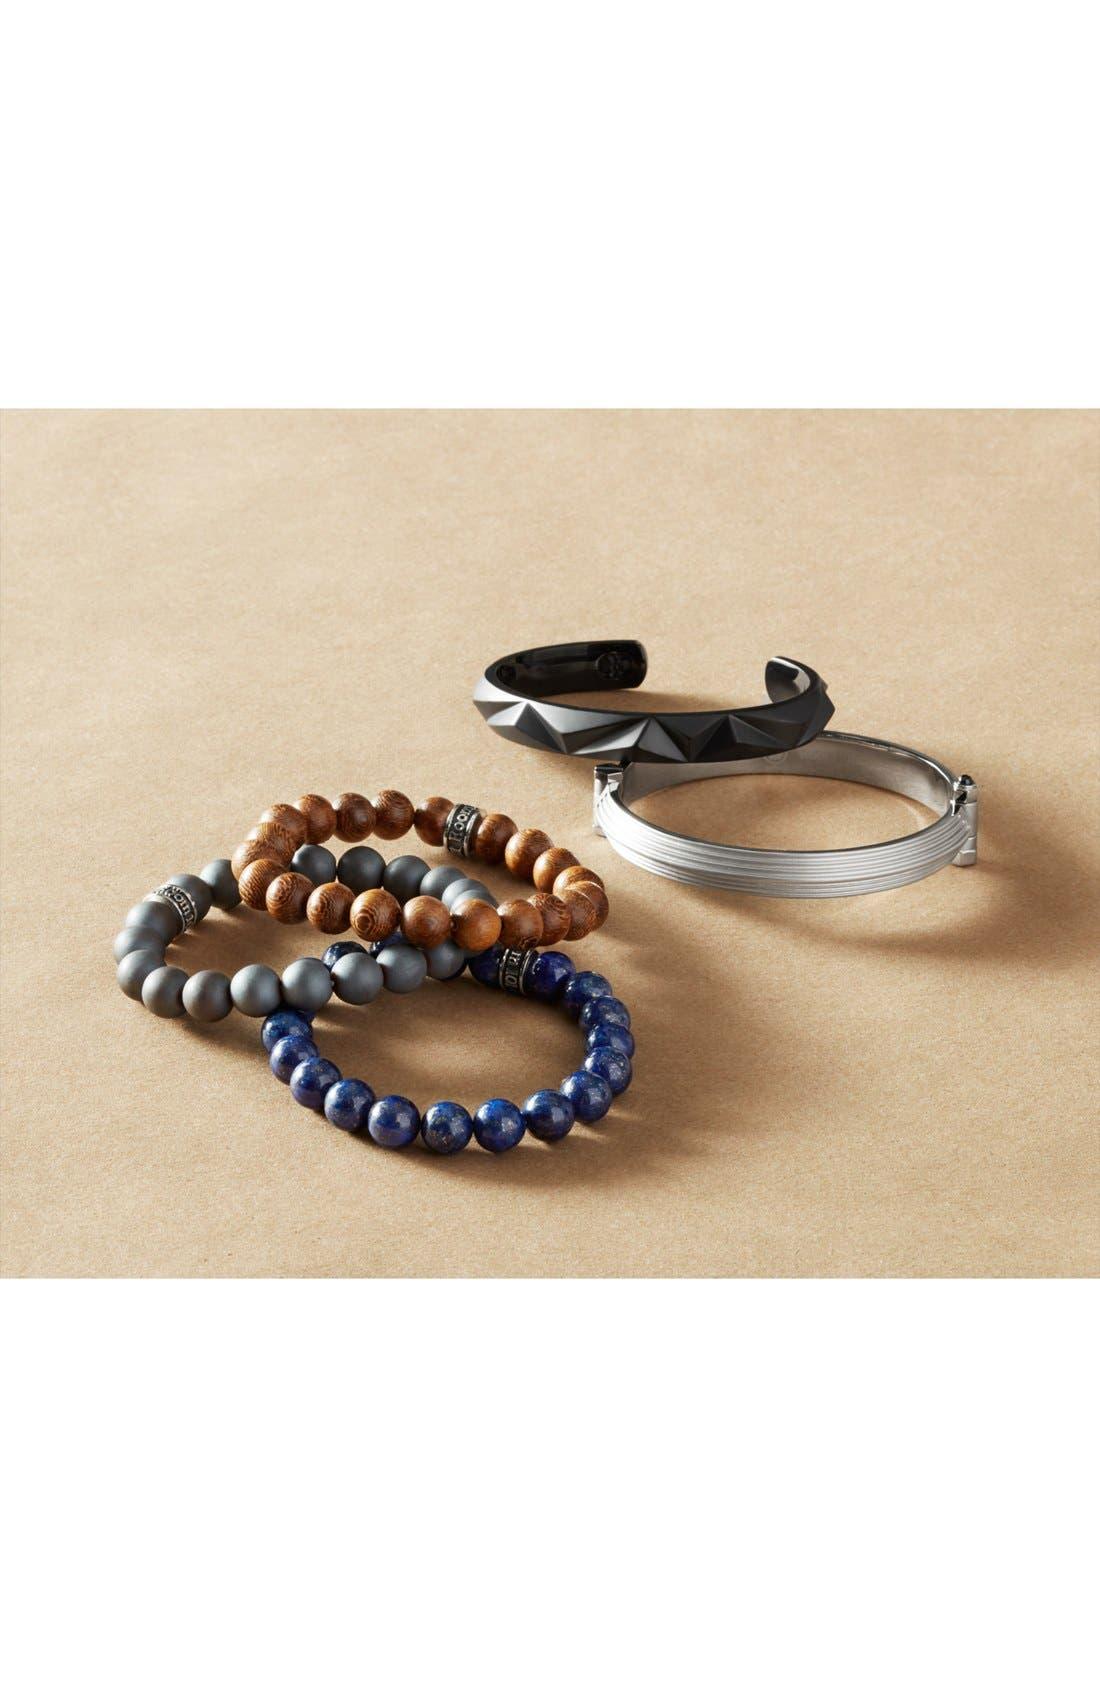 Polished Agate Bead Bracelet,                             Alternate thumbnail 6, color,